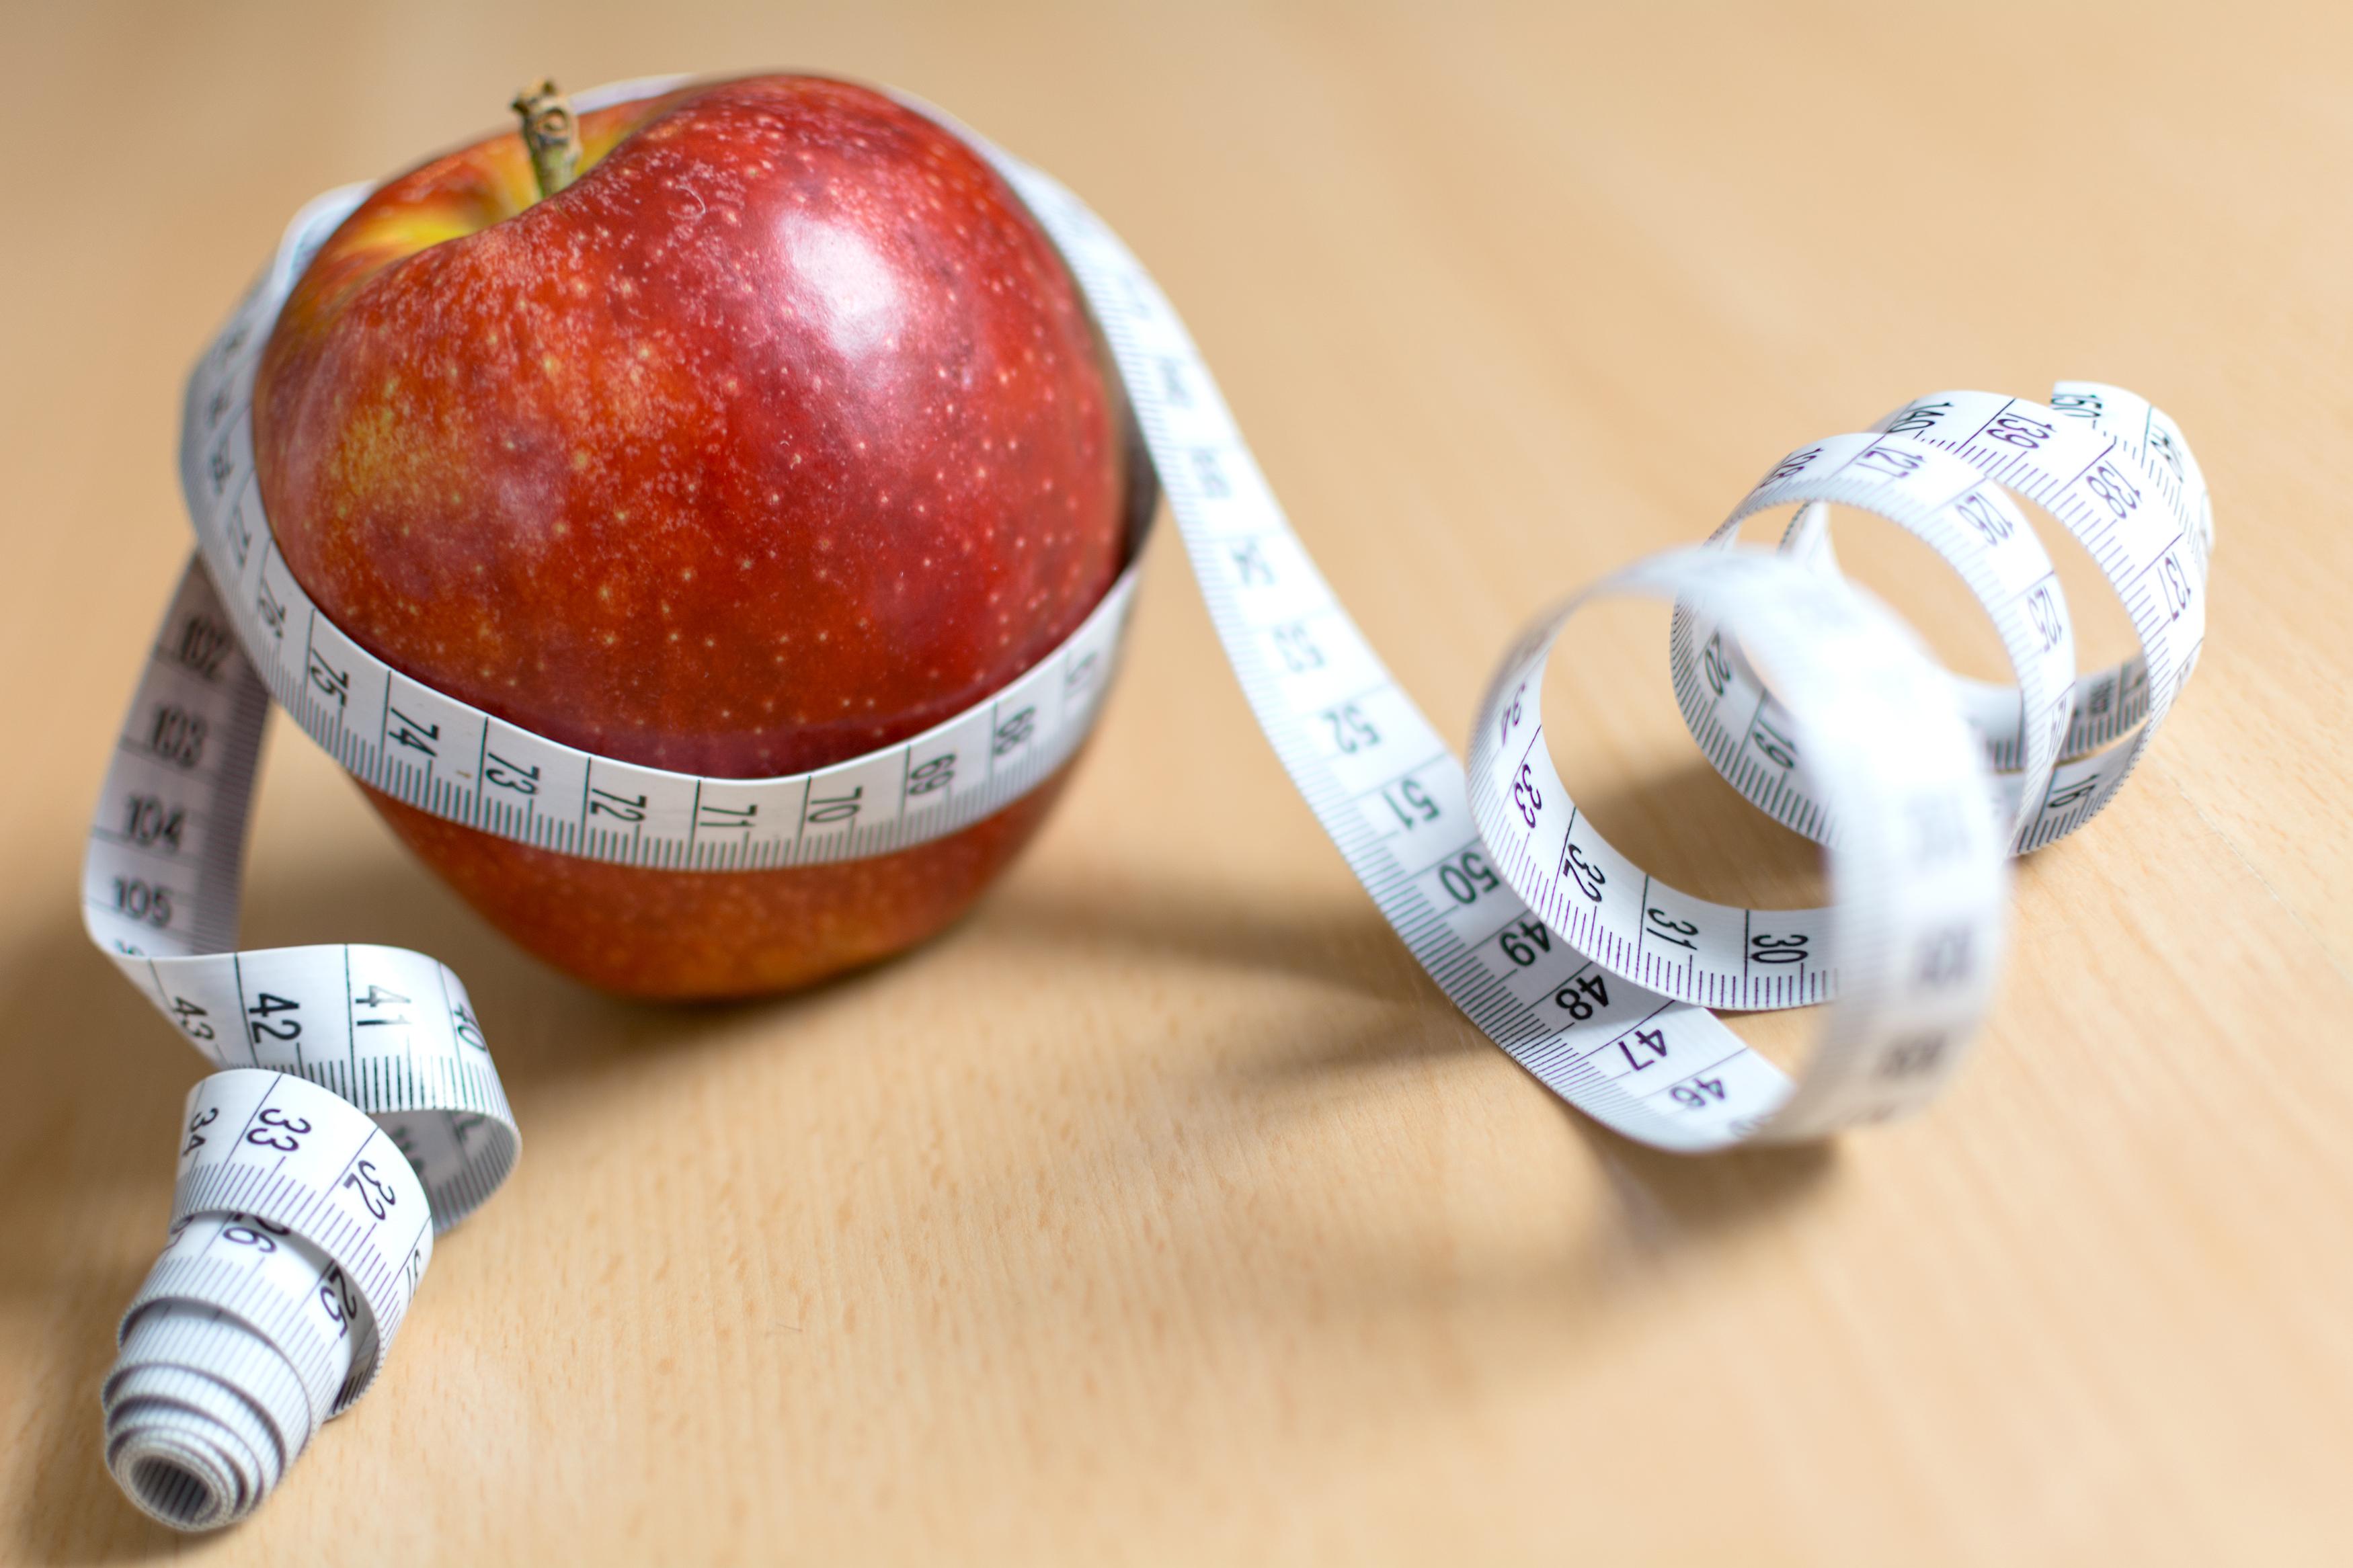 apple-and-measuring-tape.jpg